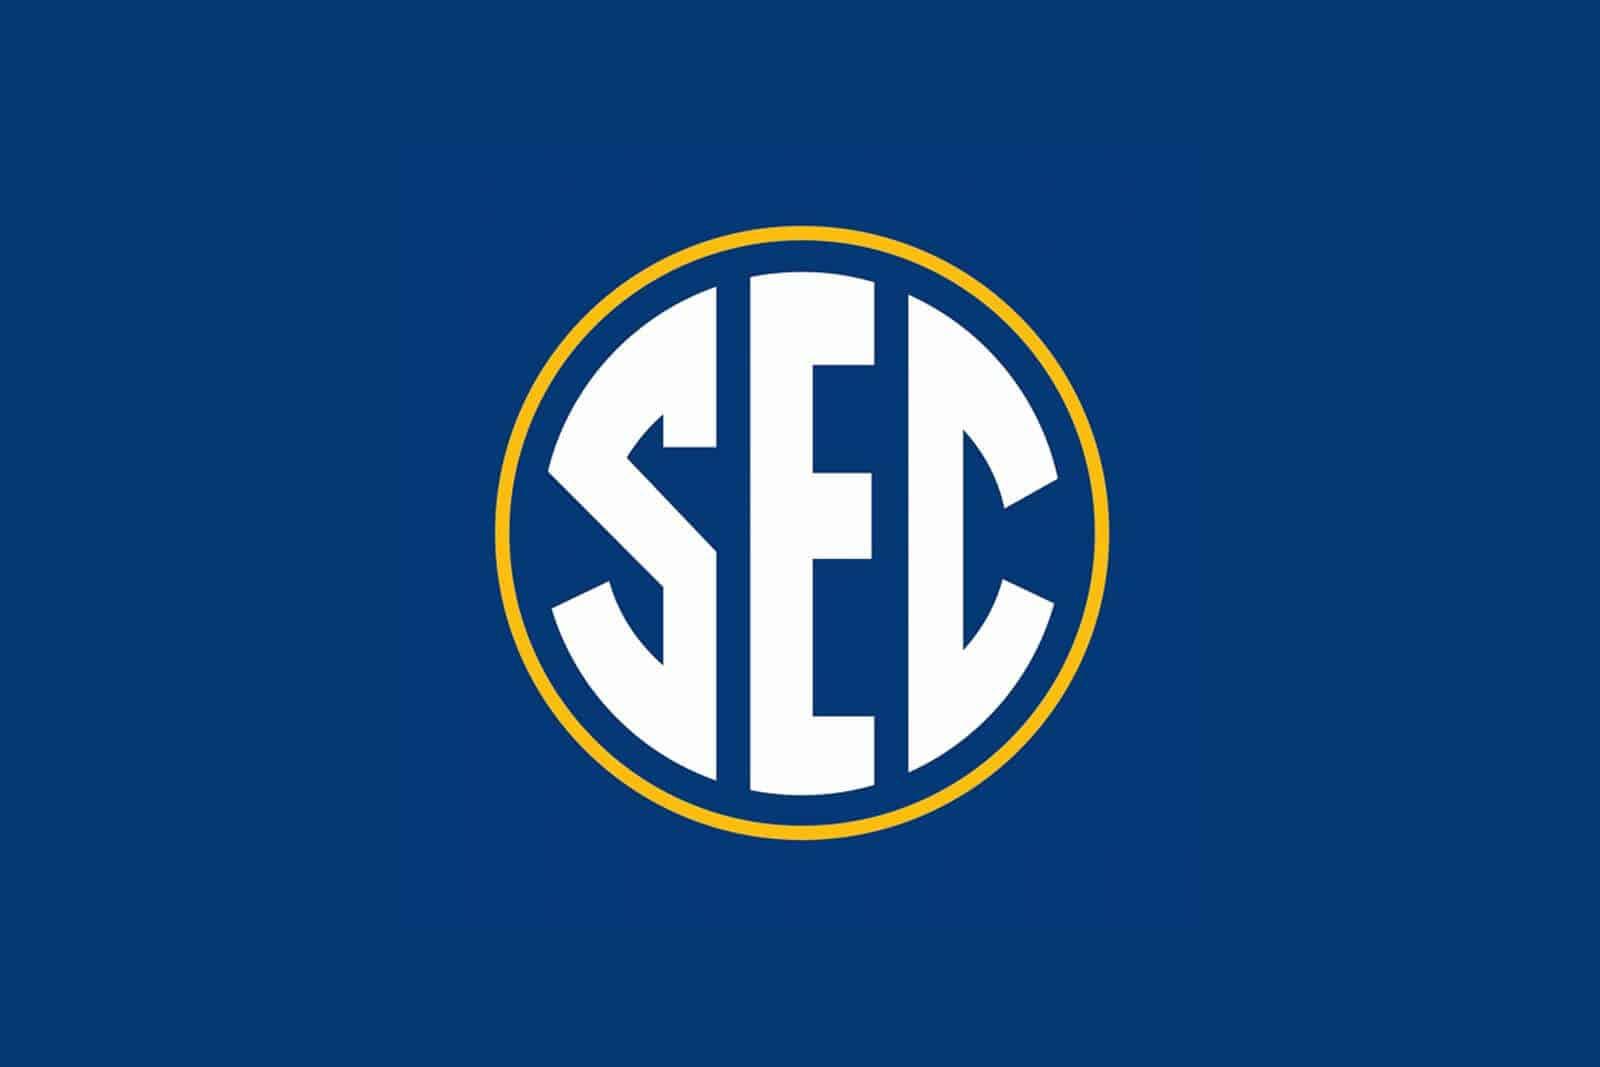 Georgia game against Vanderbilt won't happen as planned